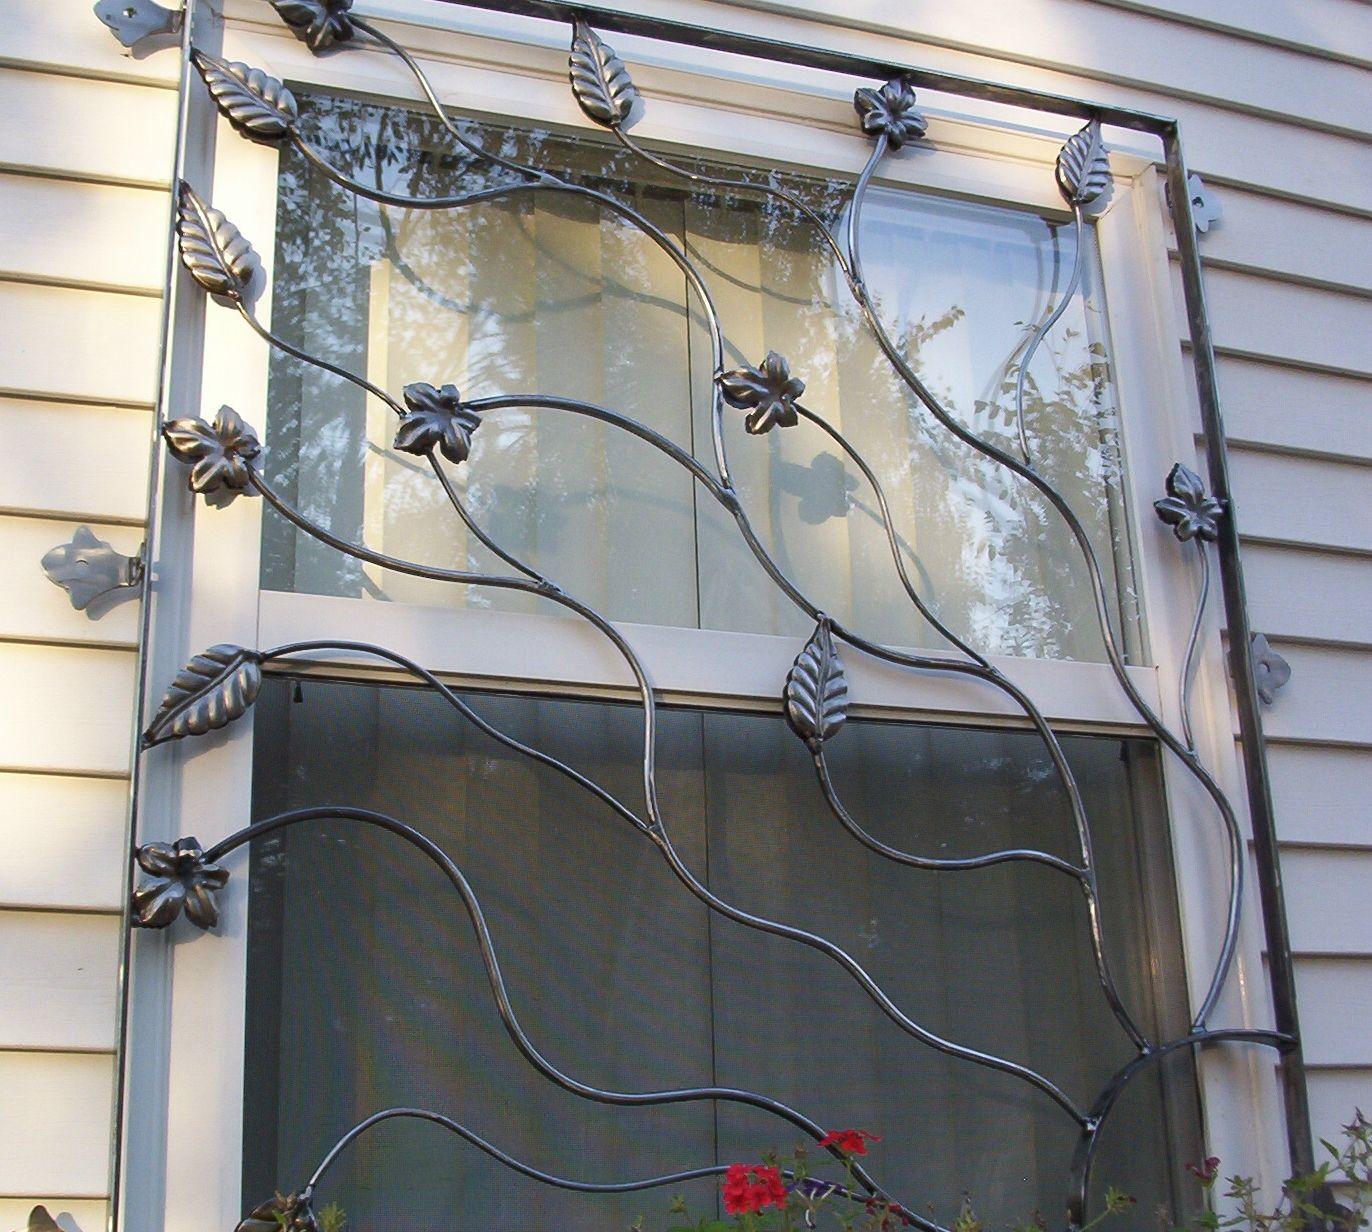 Medium Crop Of Security Bars For Windows